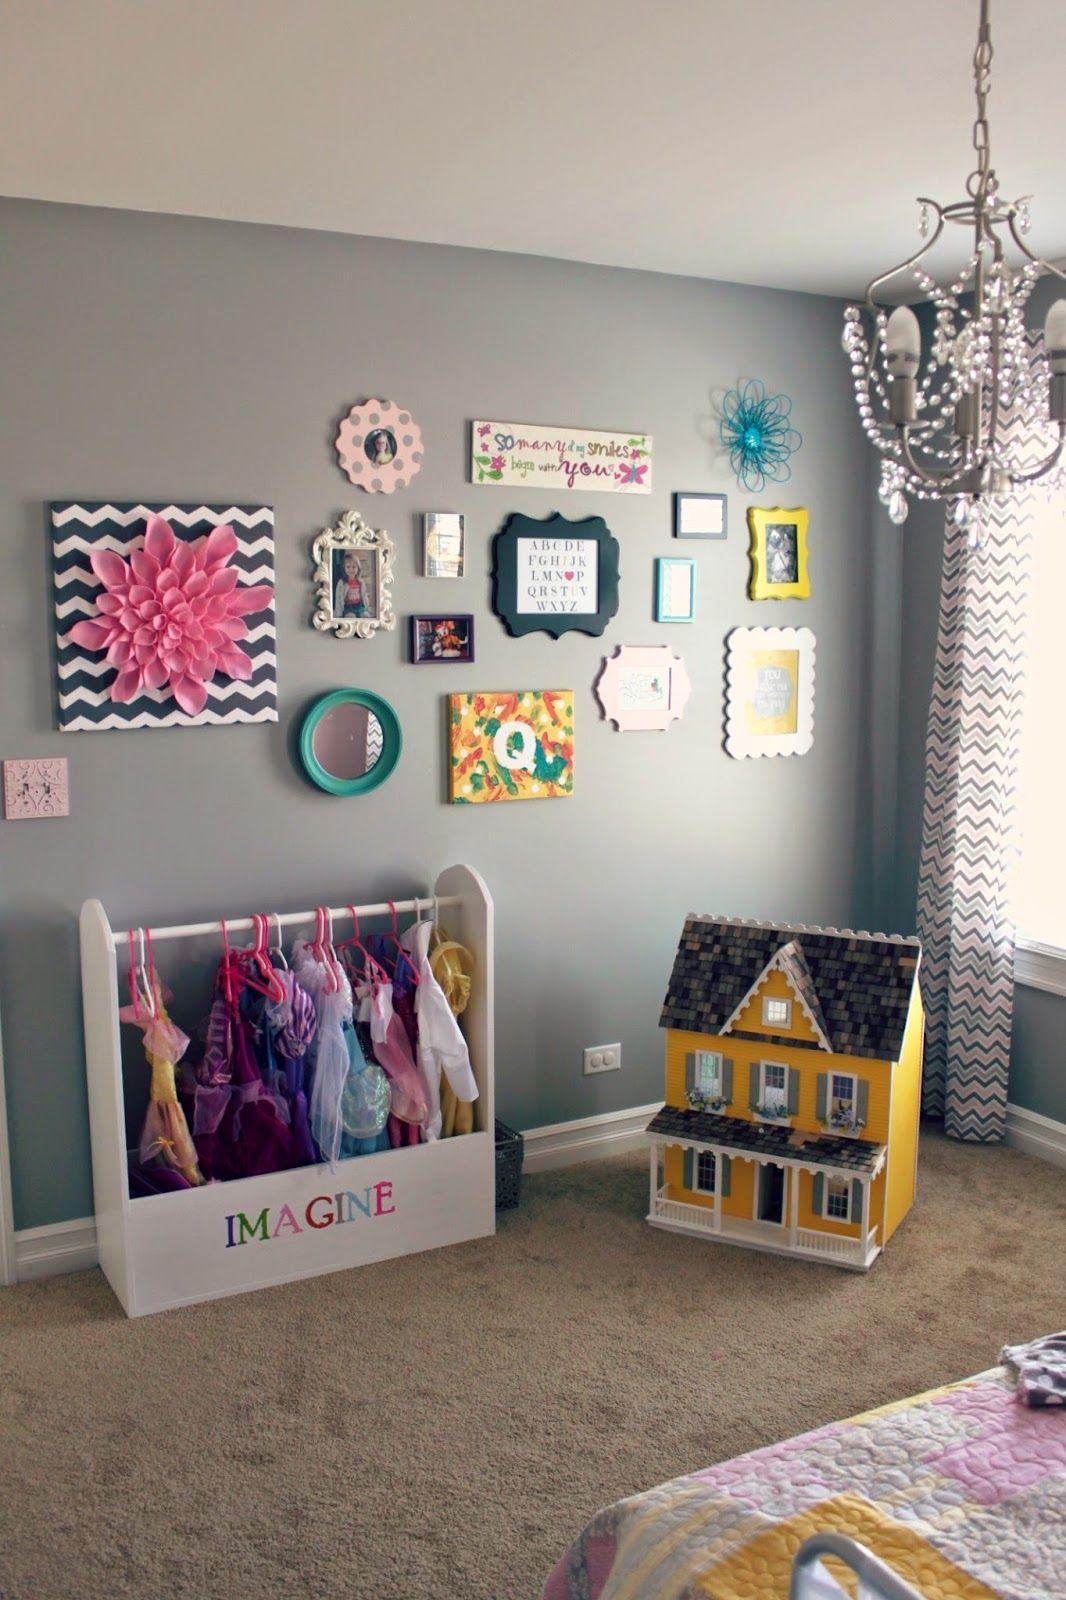 Img 8843edit Jpg 1 066 1 600 Pixels Kid Room Decor Diy Home Decor Bedroom Girl Little Girl Rooms